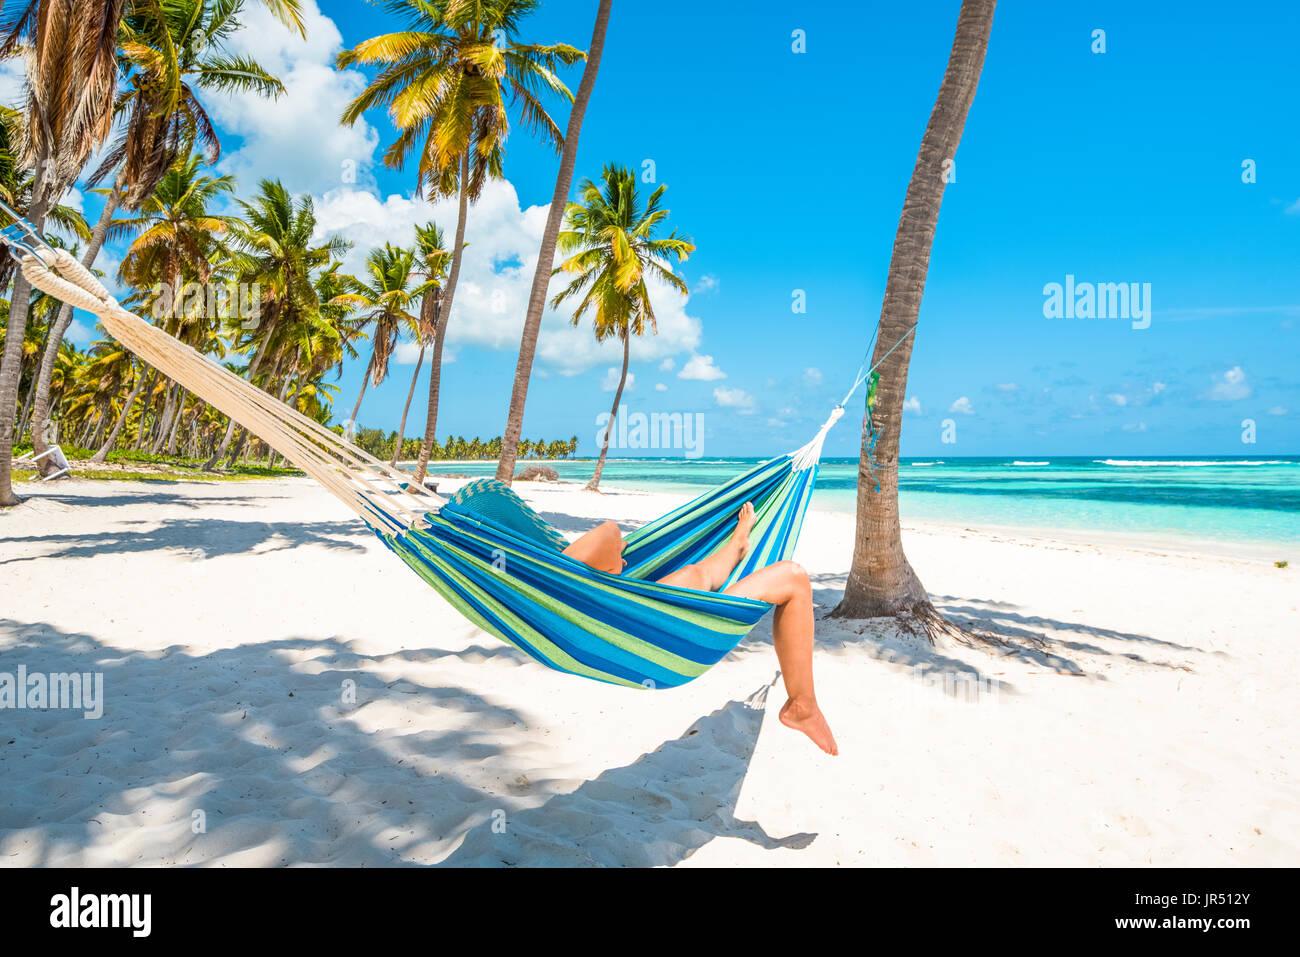 Canto de la Playa, Saona Island, East National Park (Parque Nacional del Este), Dominican Republic, Caribbean Sea. Woman relaxing on a hammock. - Stock Image